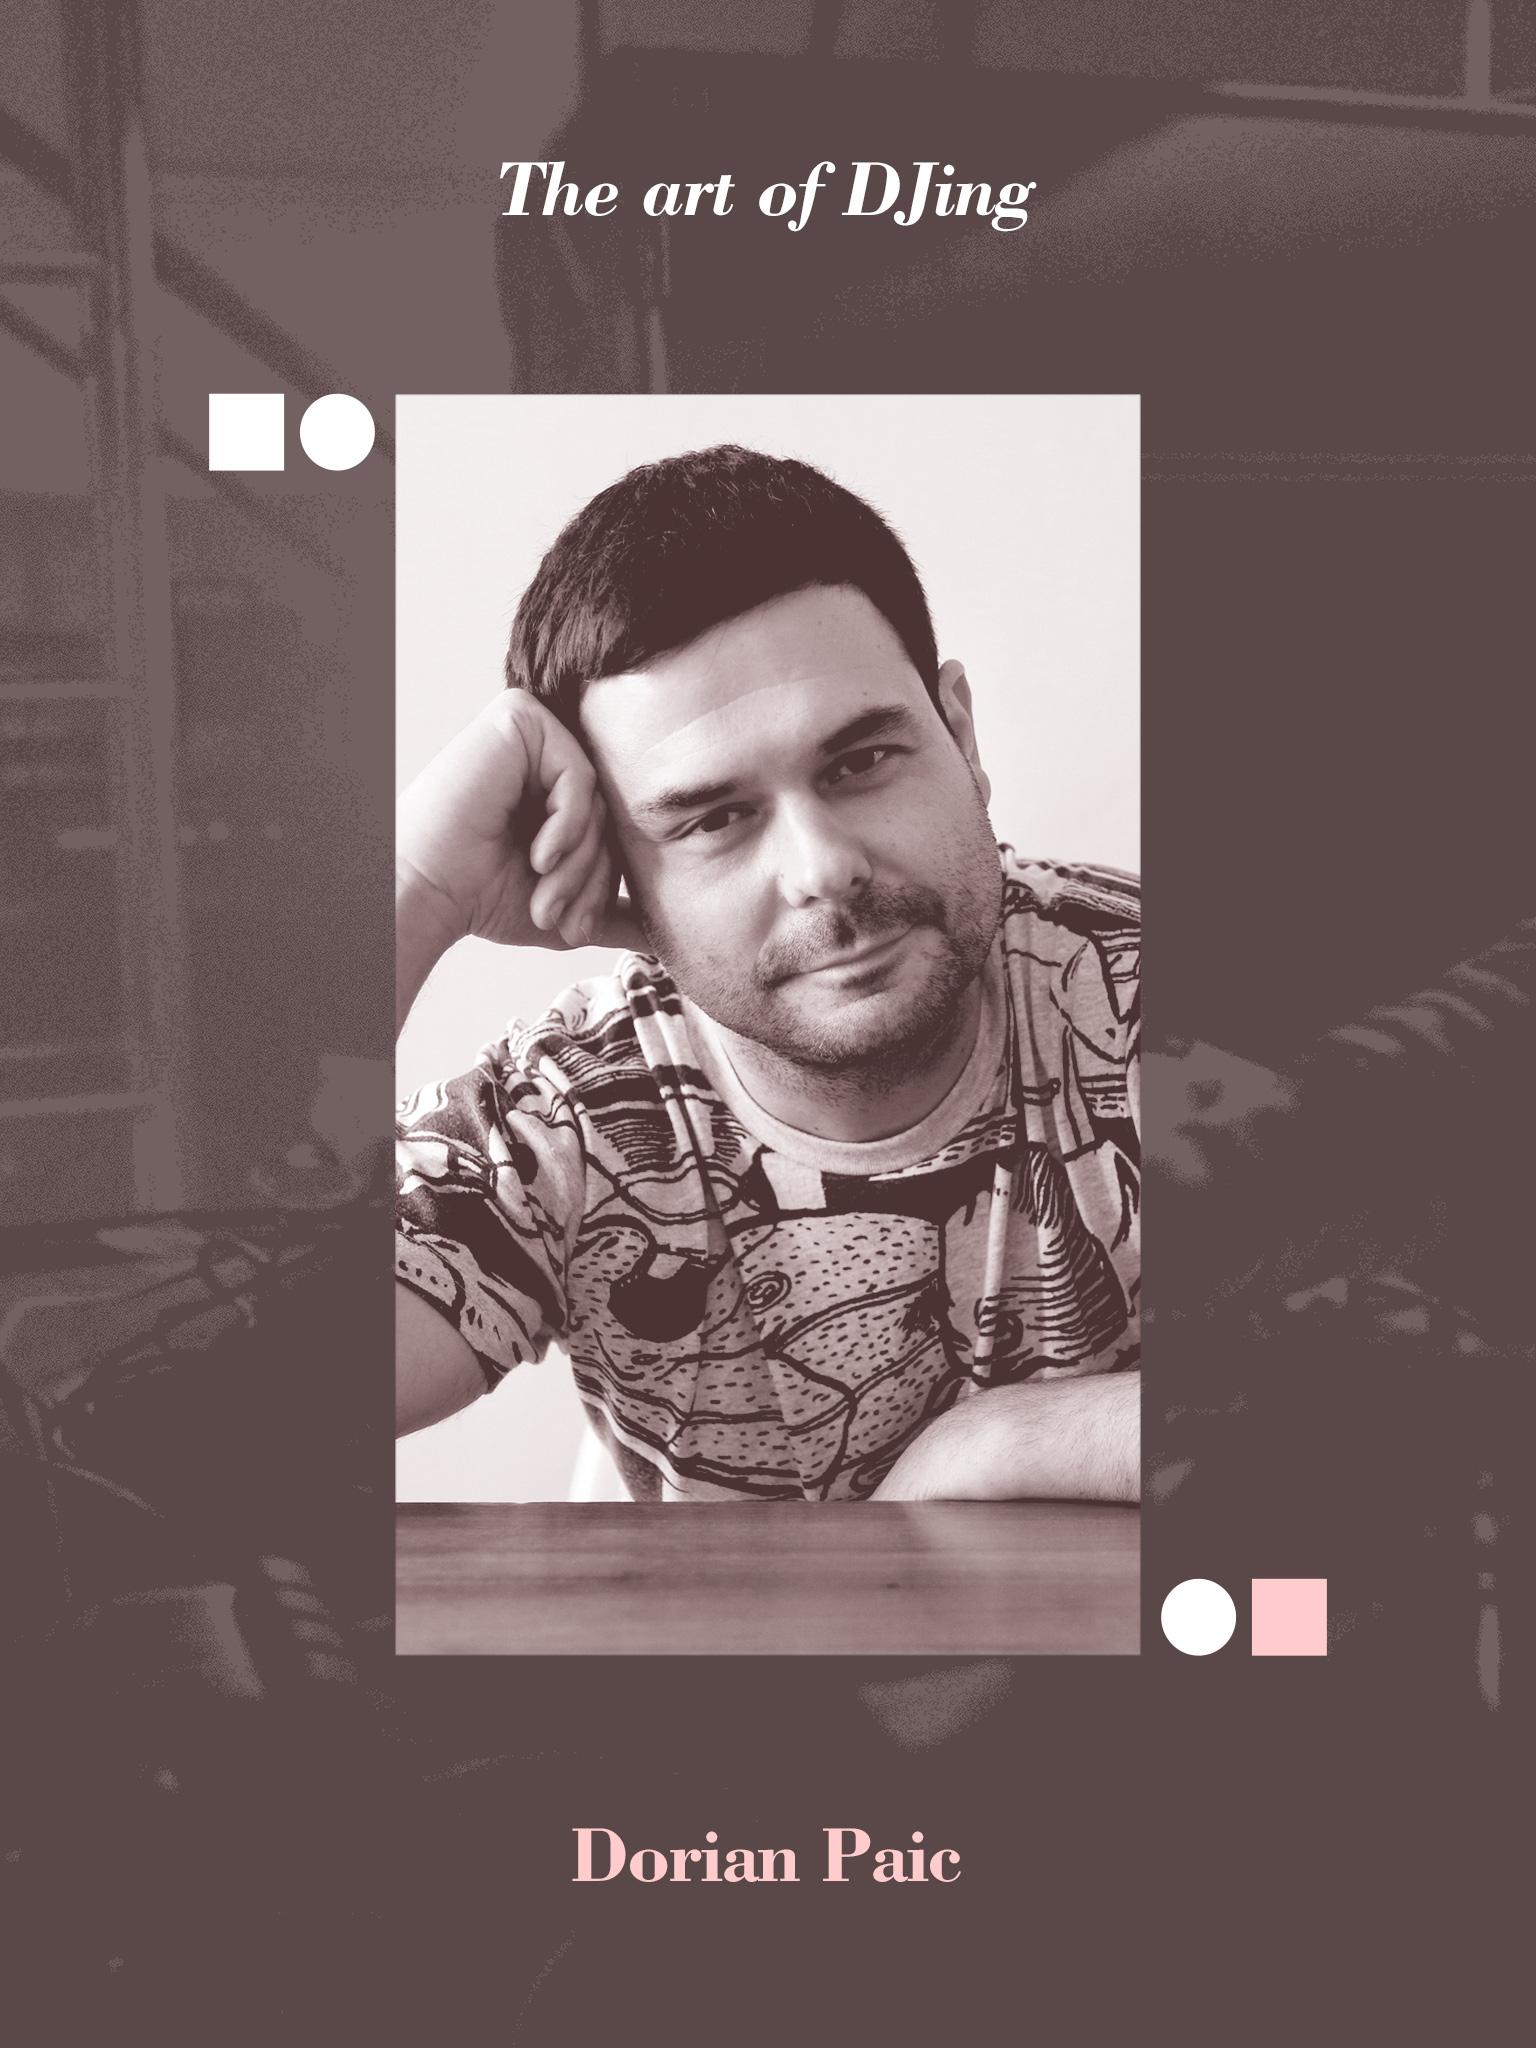 The art of DJing: Dorian Paic